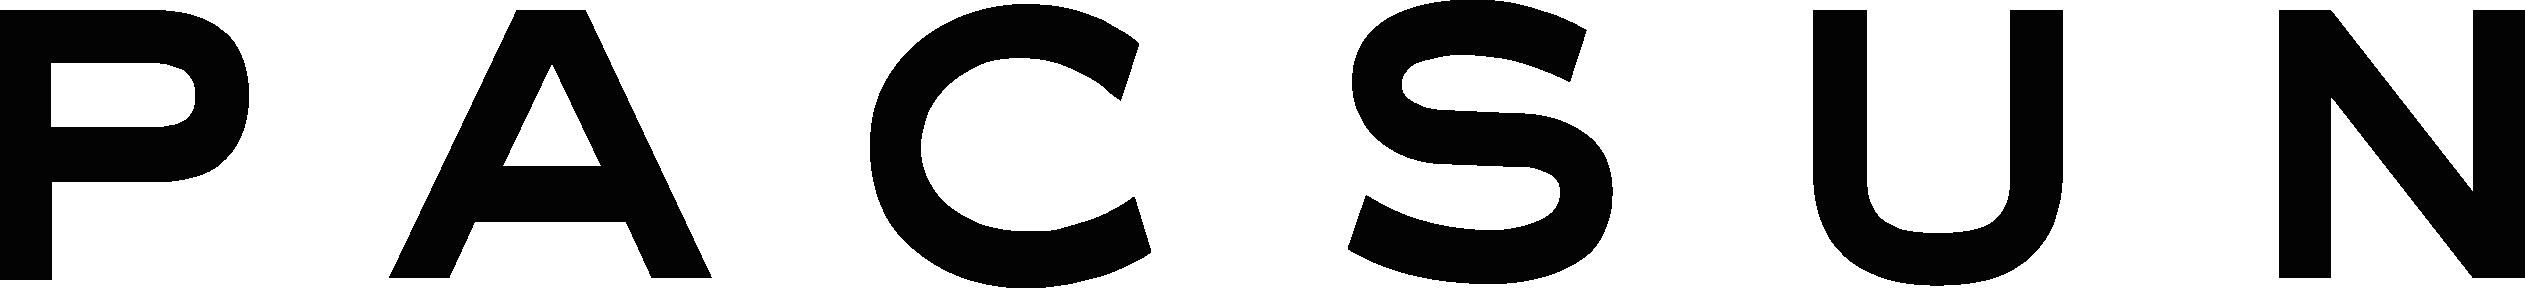 Pacsun Logo Download Vector.